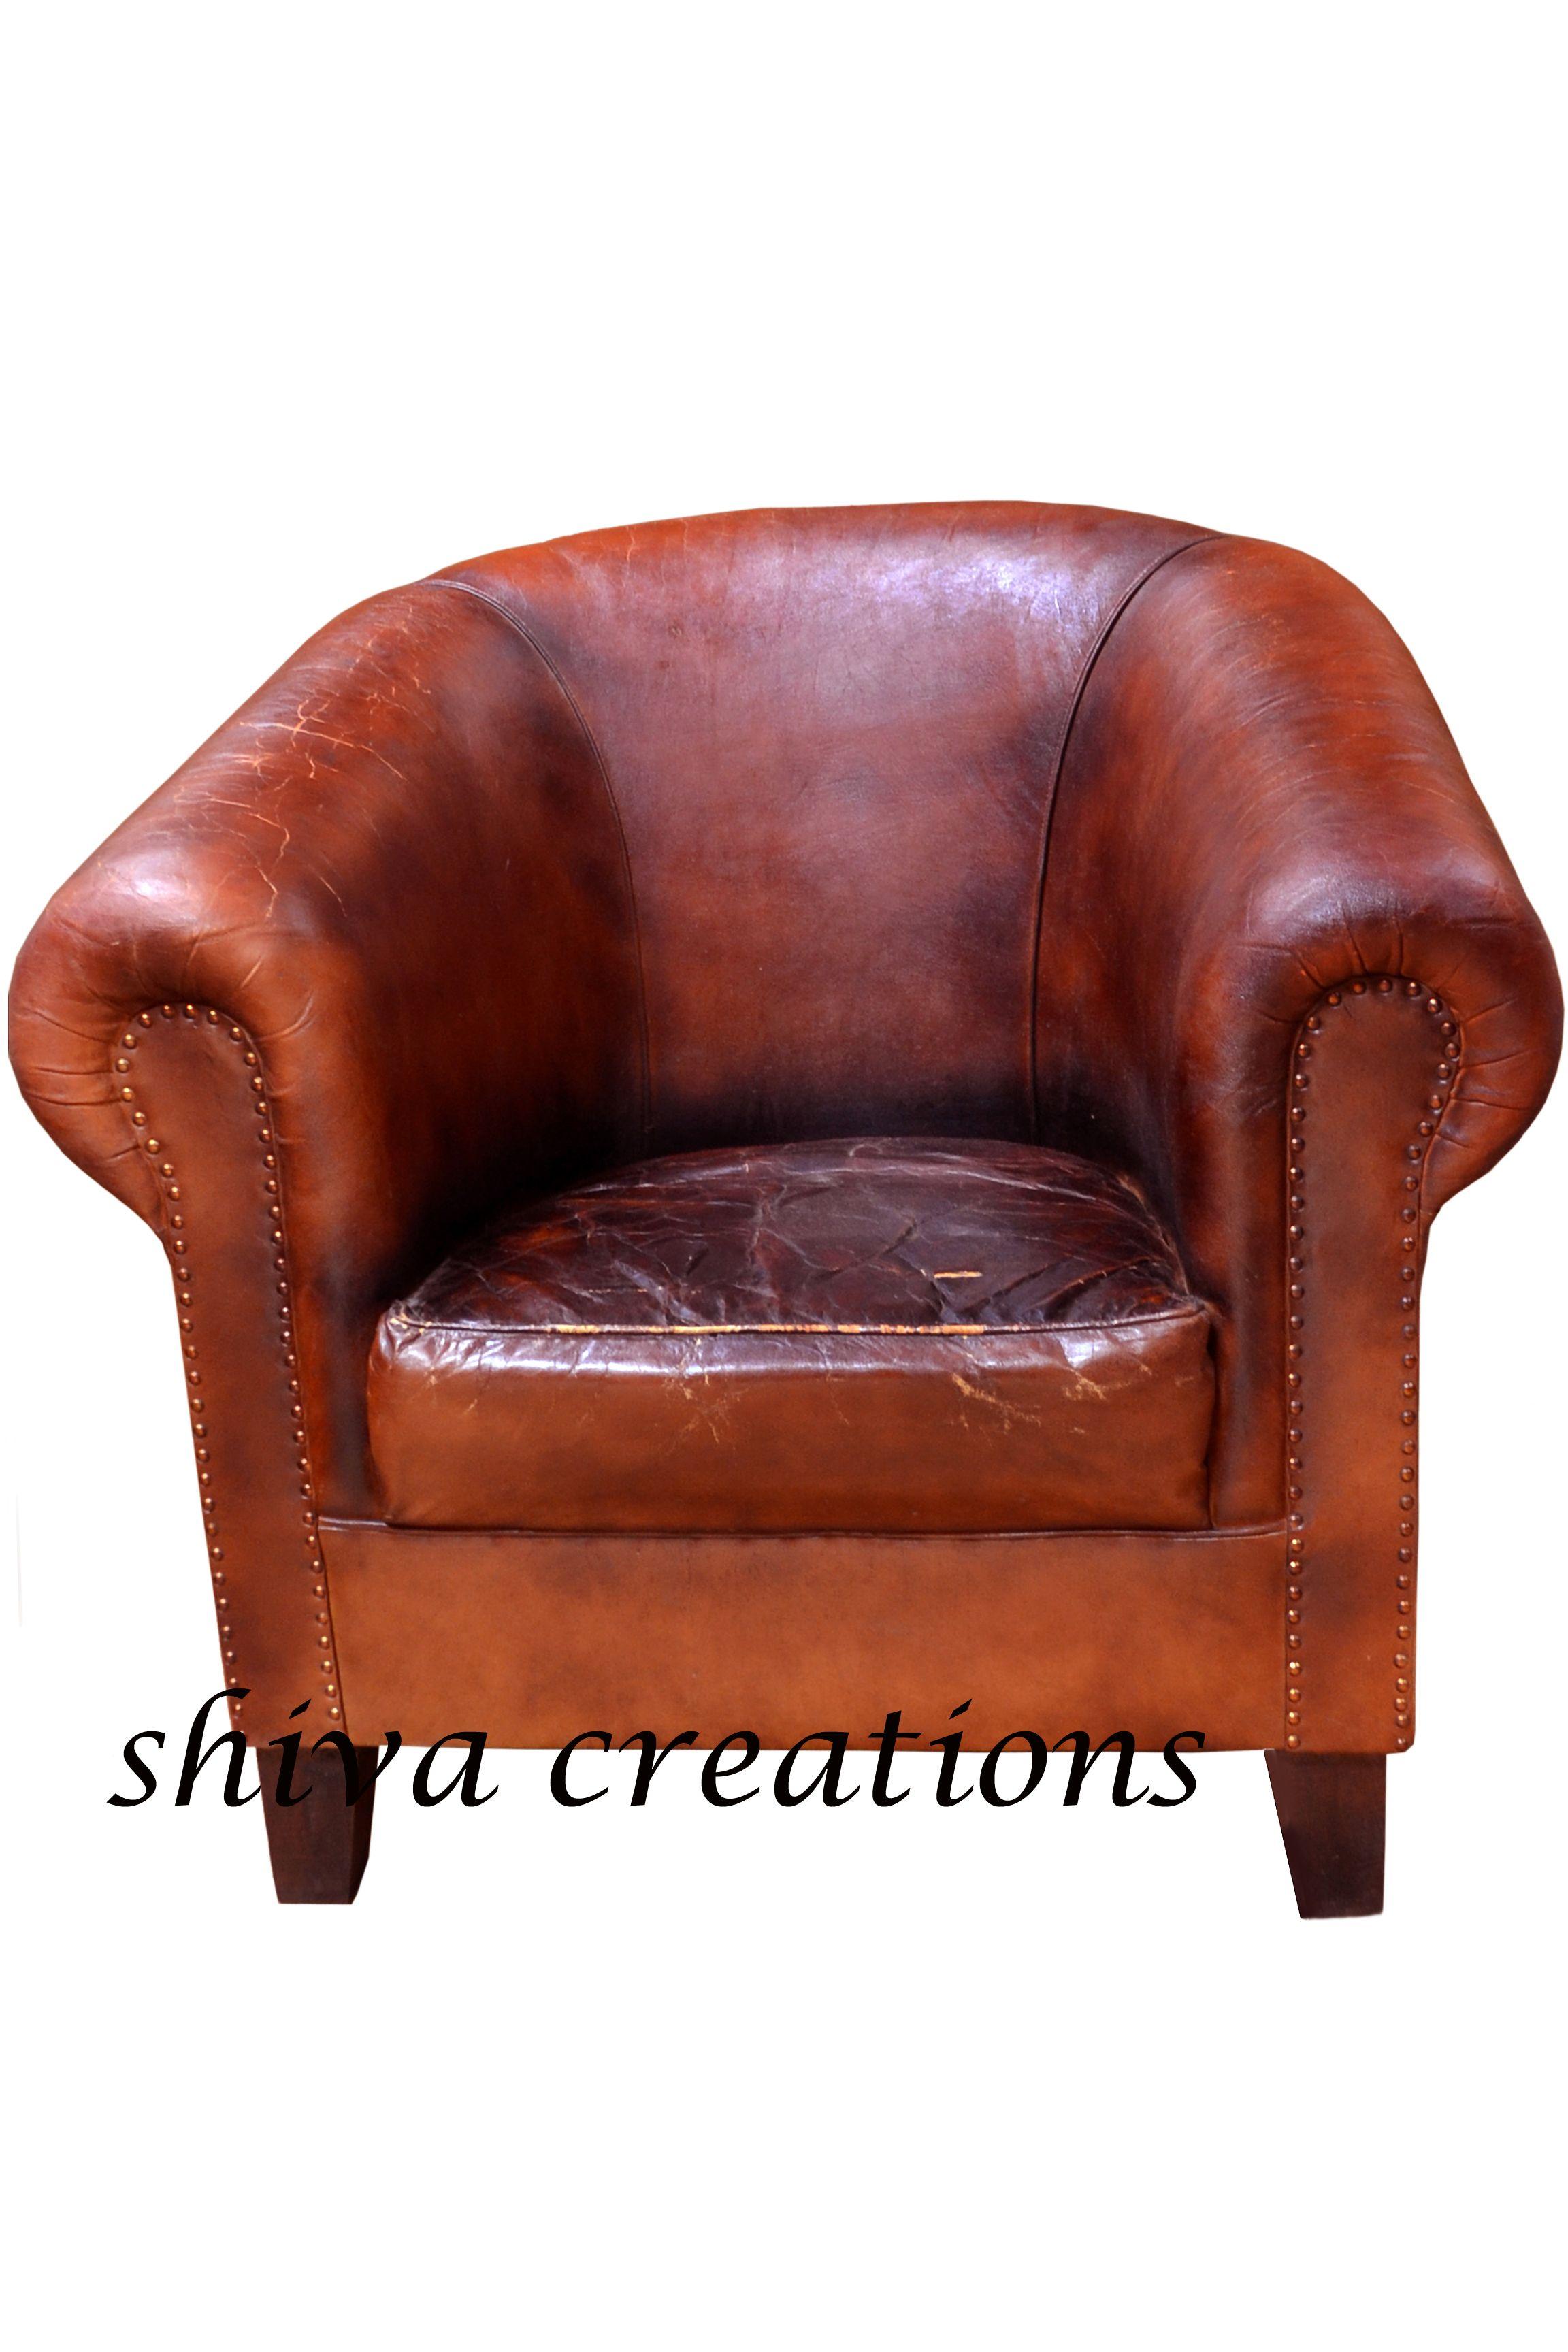 Phenomenal Vintage Leather Sofa India Wooden Leather Handcrafted Creativecarmelina Interior Chair Design Creativecarmelinacom